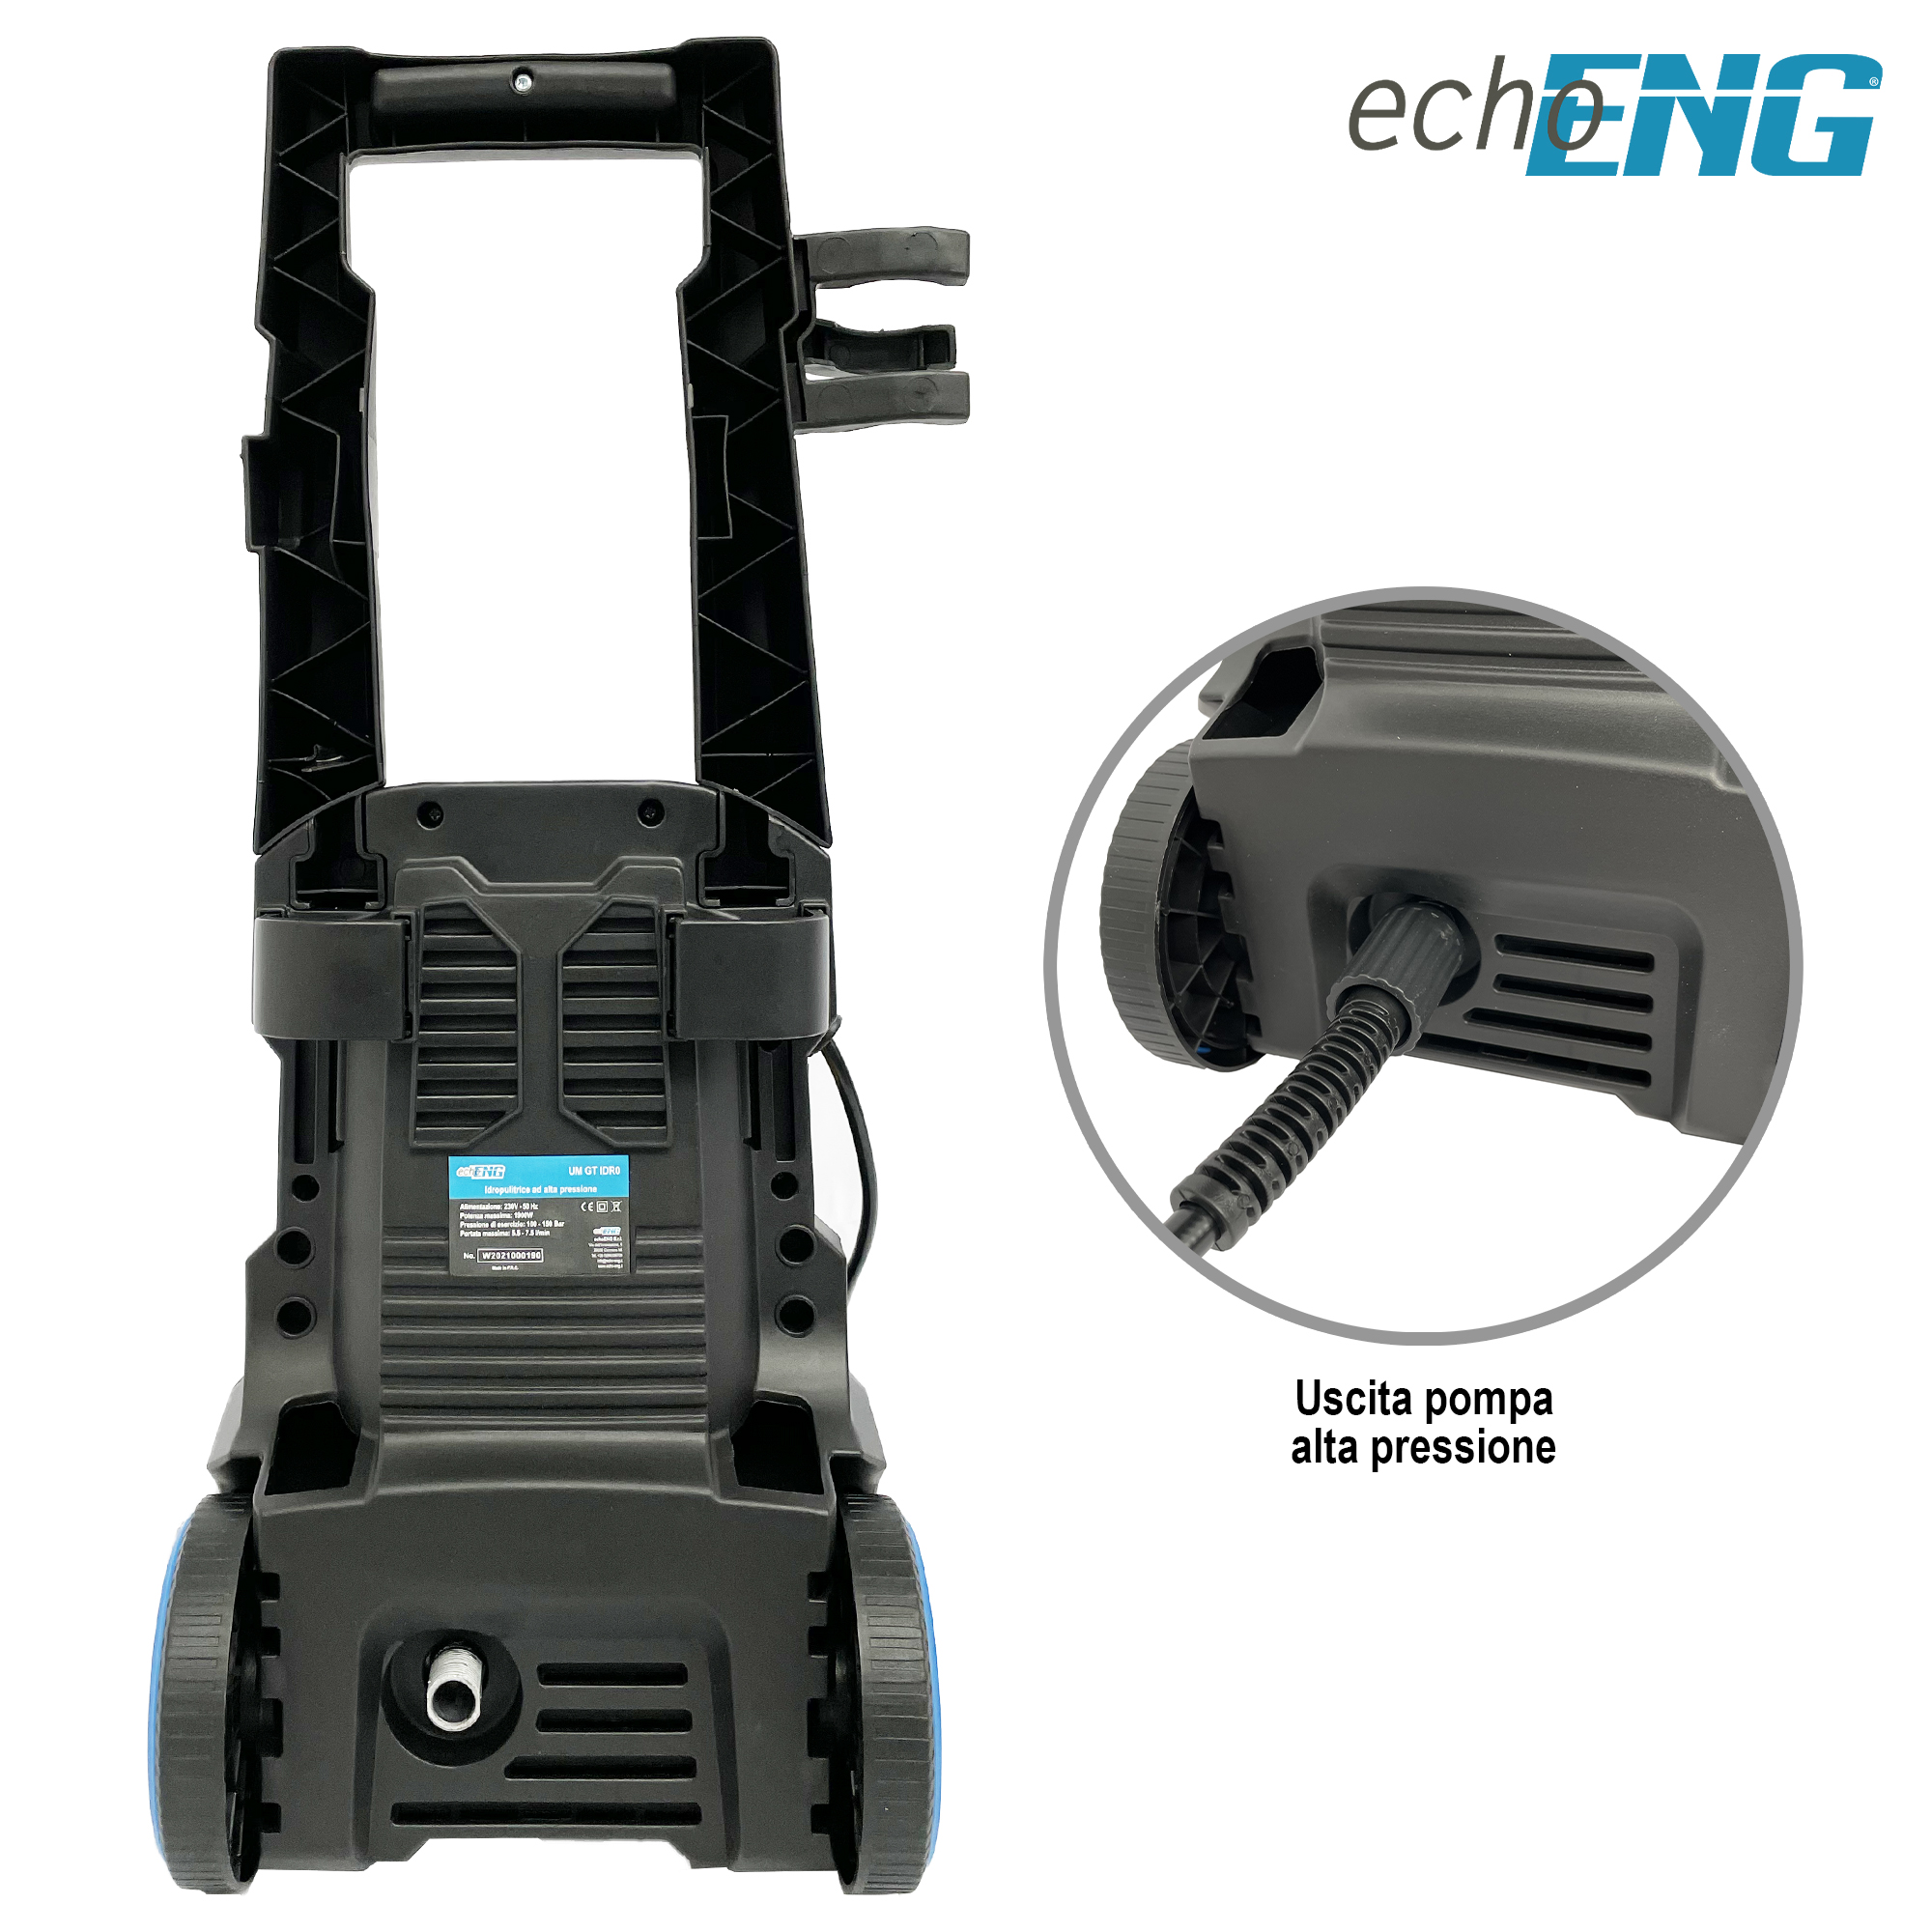 Idropulitrice ad Alta Pressione 1900W 100-150bar - echoENG - UM GT IDR0